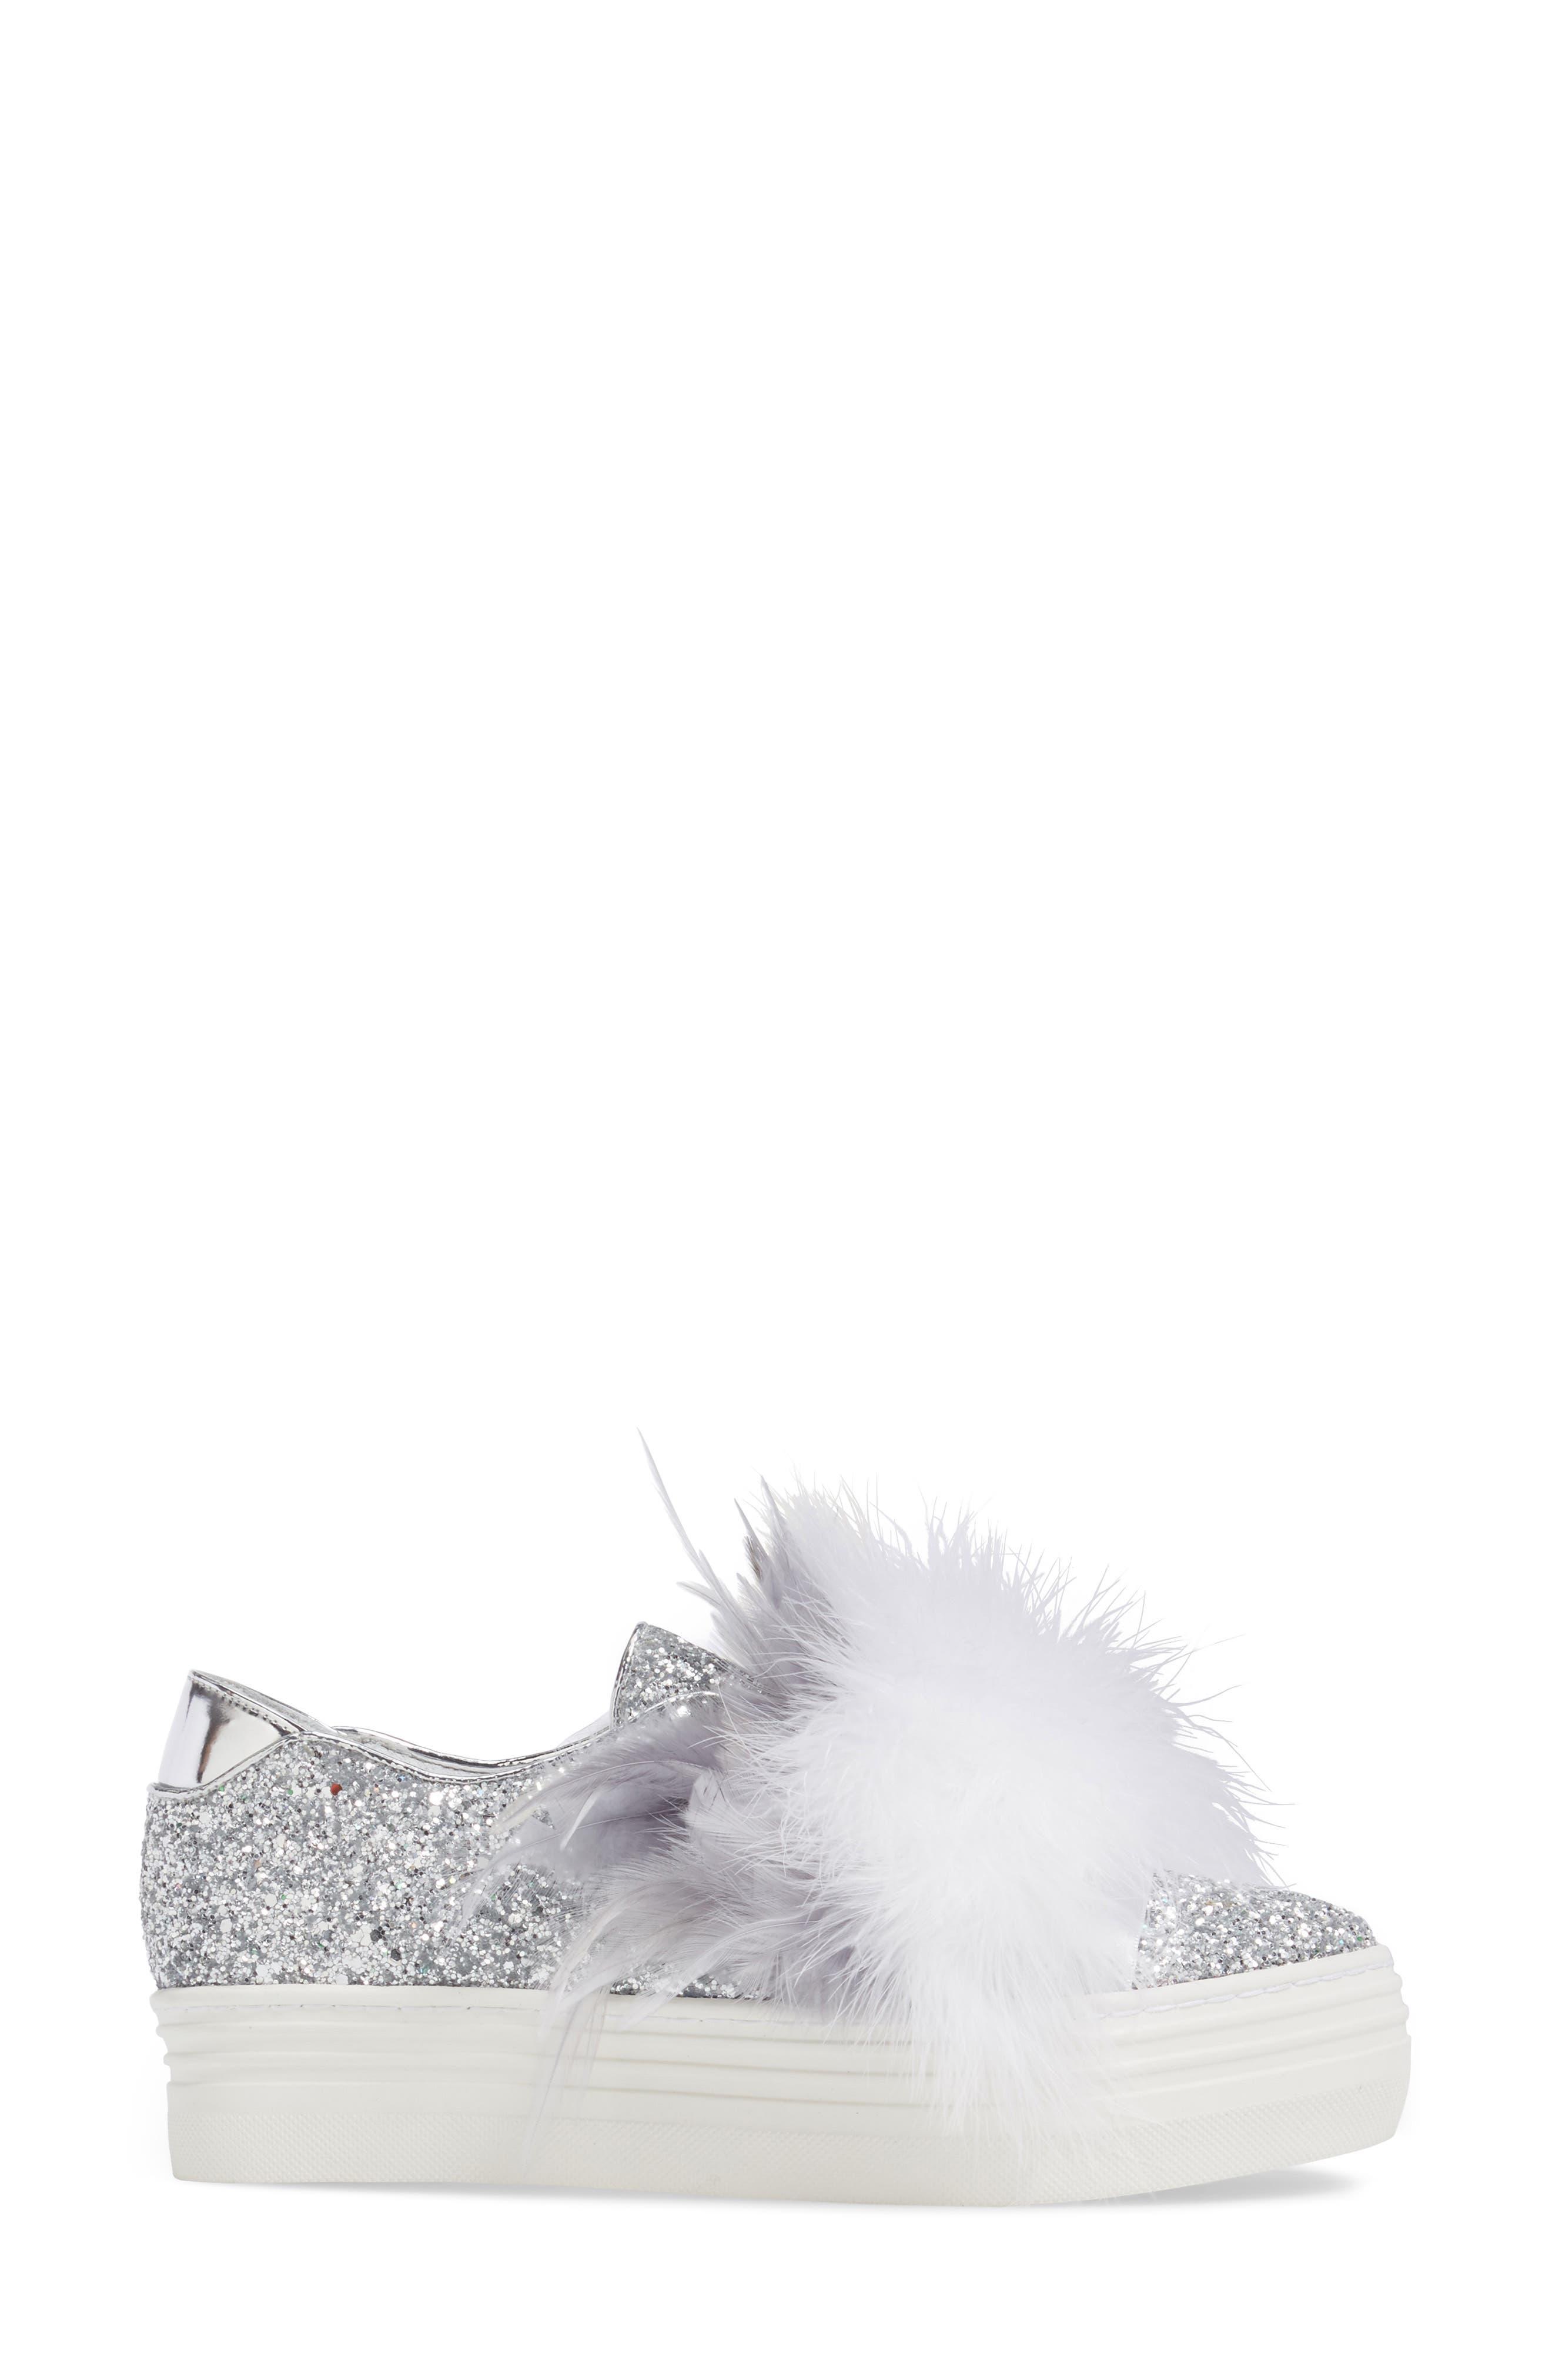 Kate Feathered Slip-On Sneaker,                             Alternate thumbnail 3, color,                             020